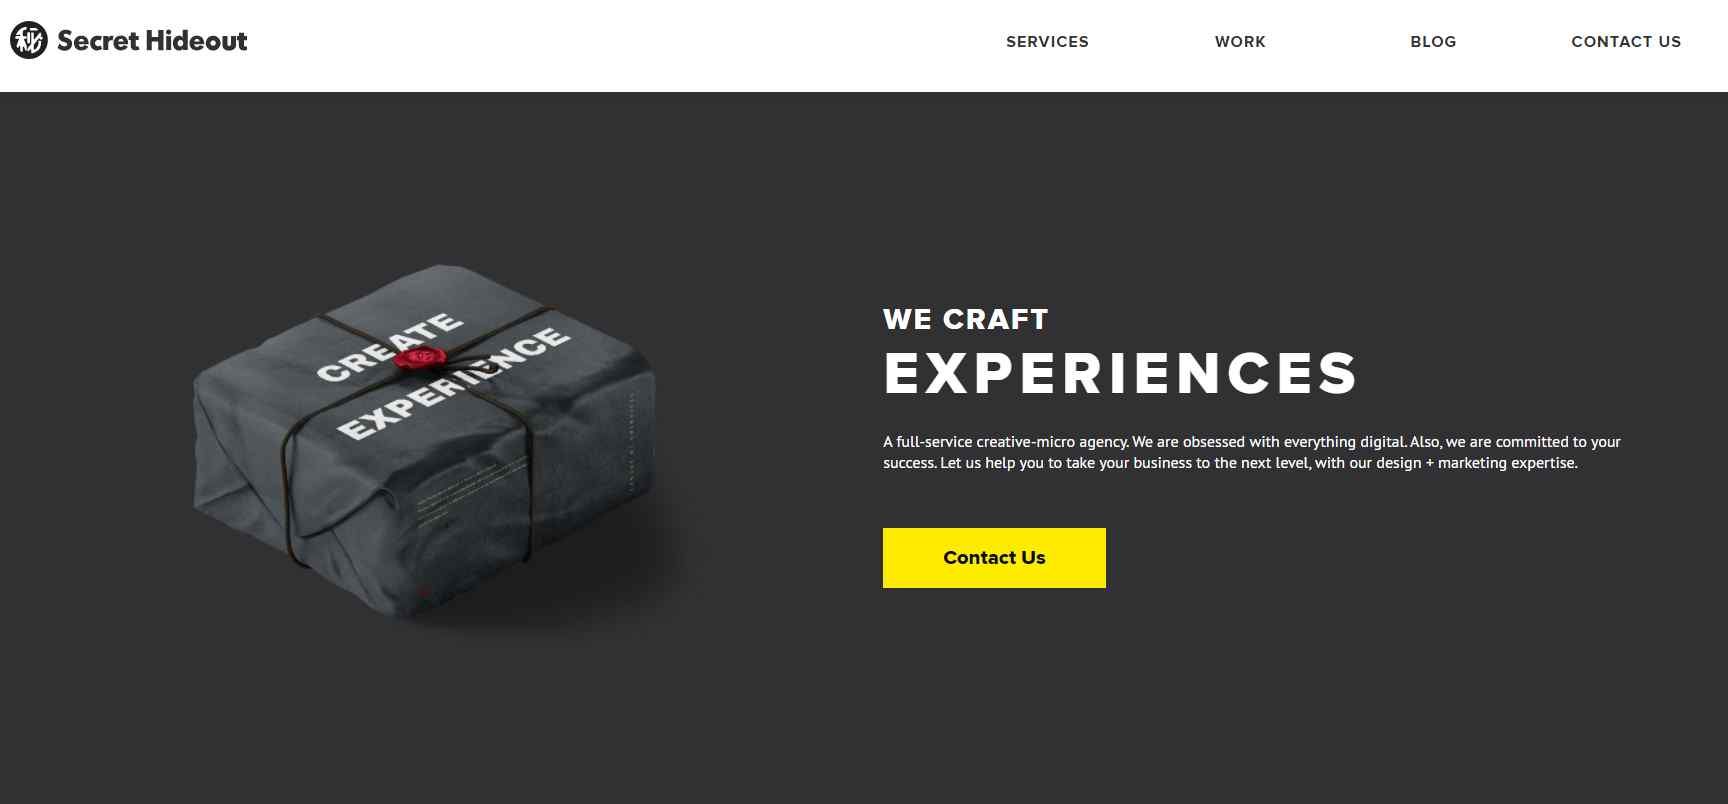 secret hideout Top UX Design Service Providers in Singapore